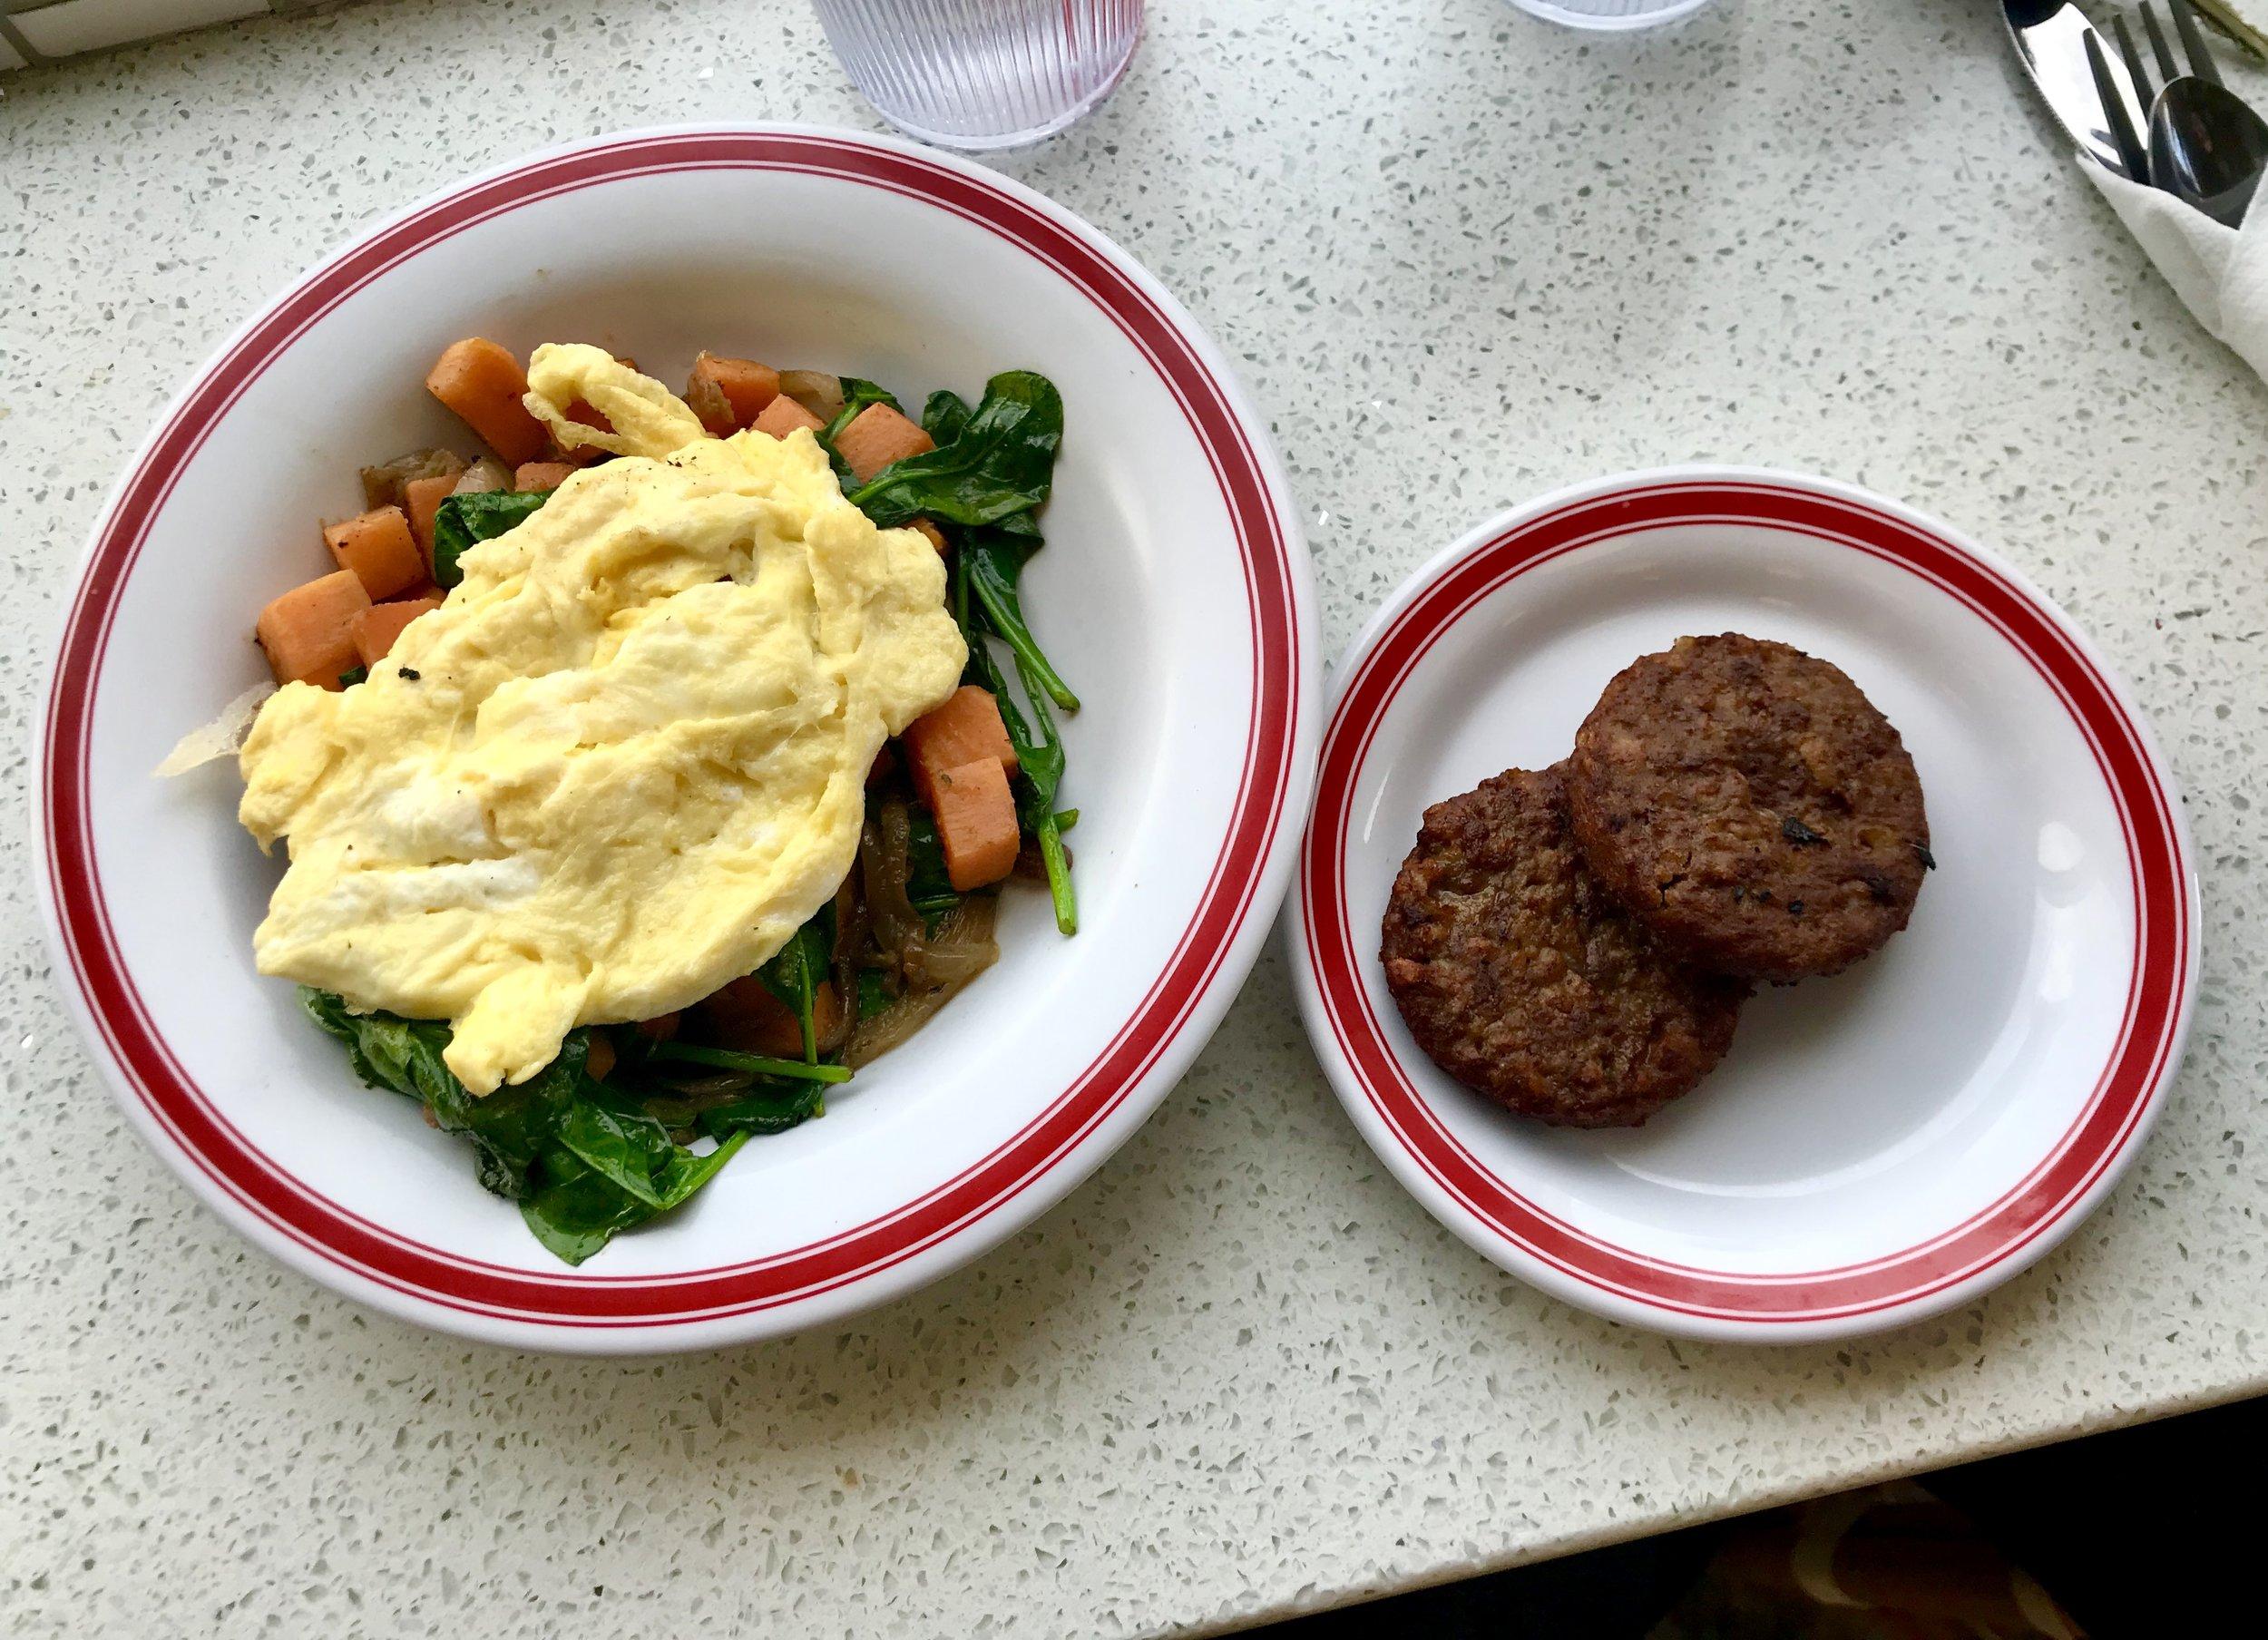 Sweet potato hash and vegan sausage